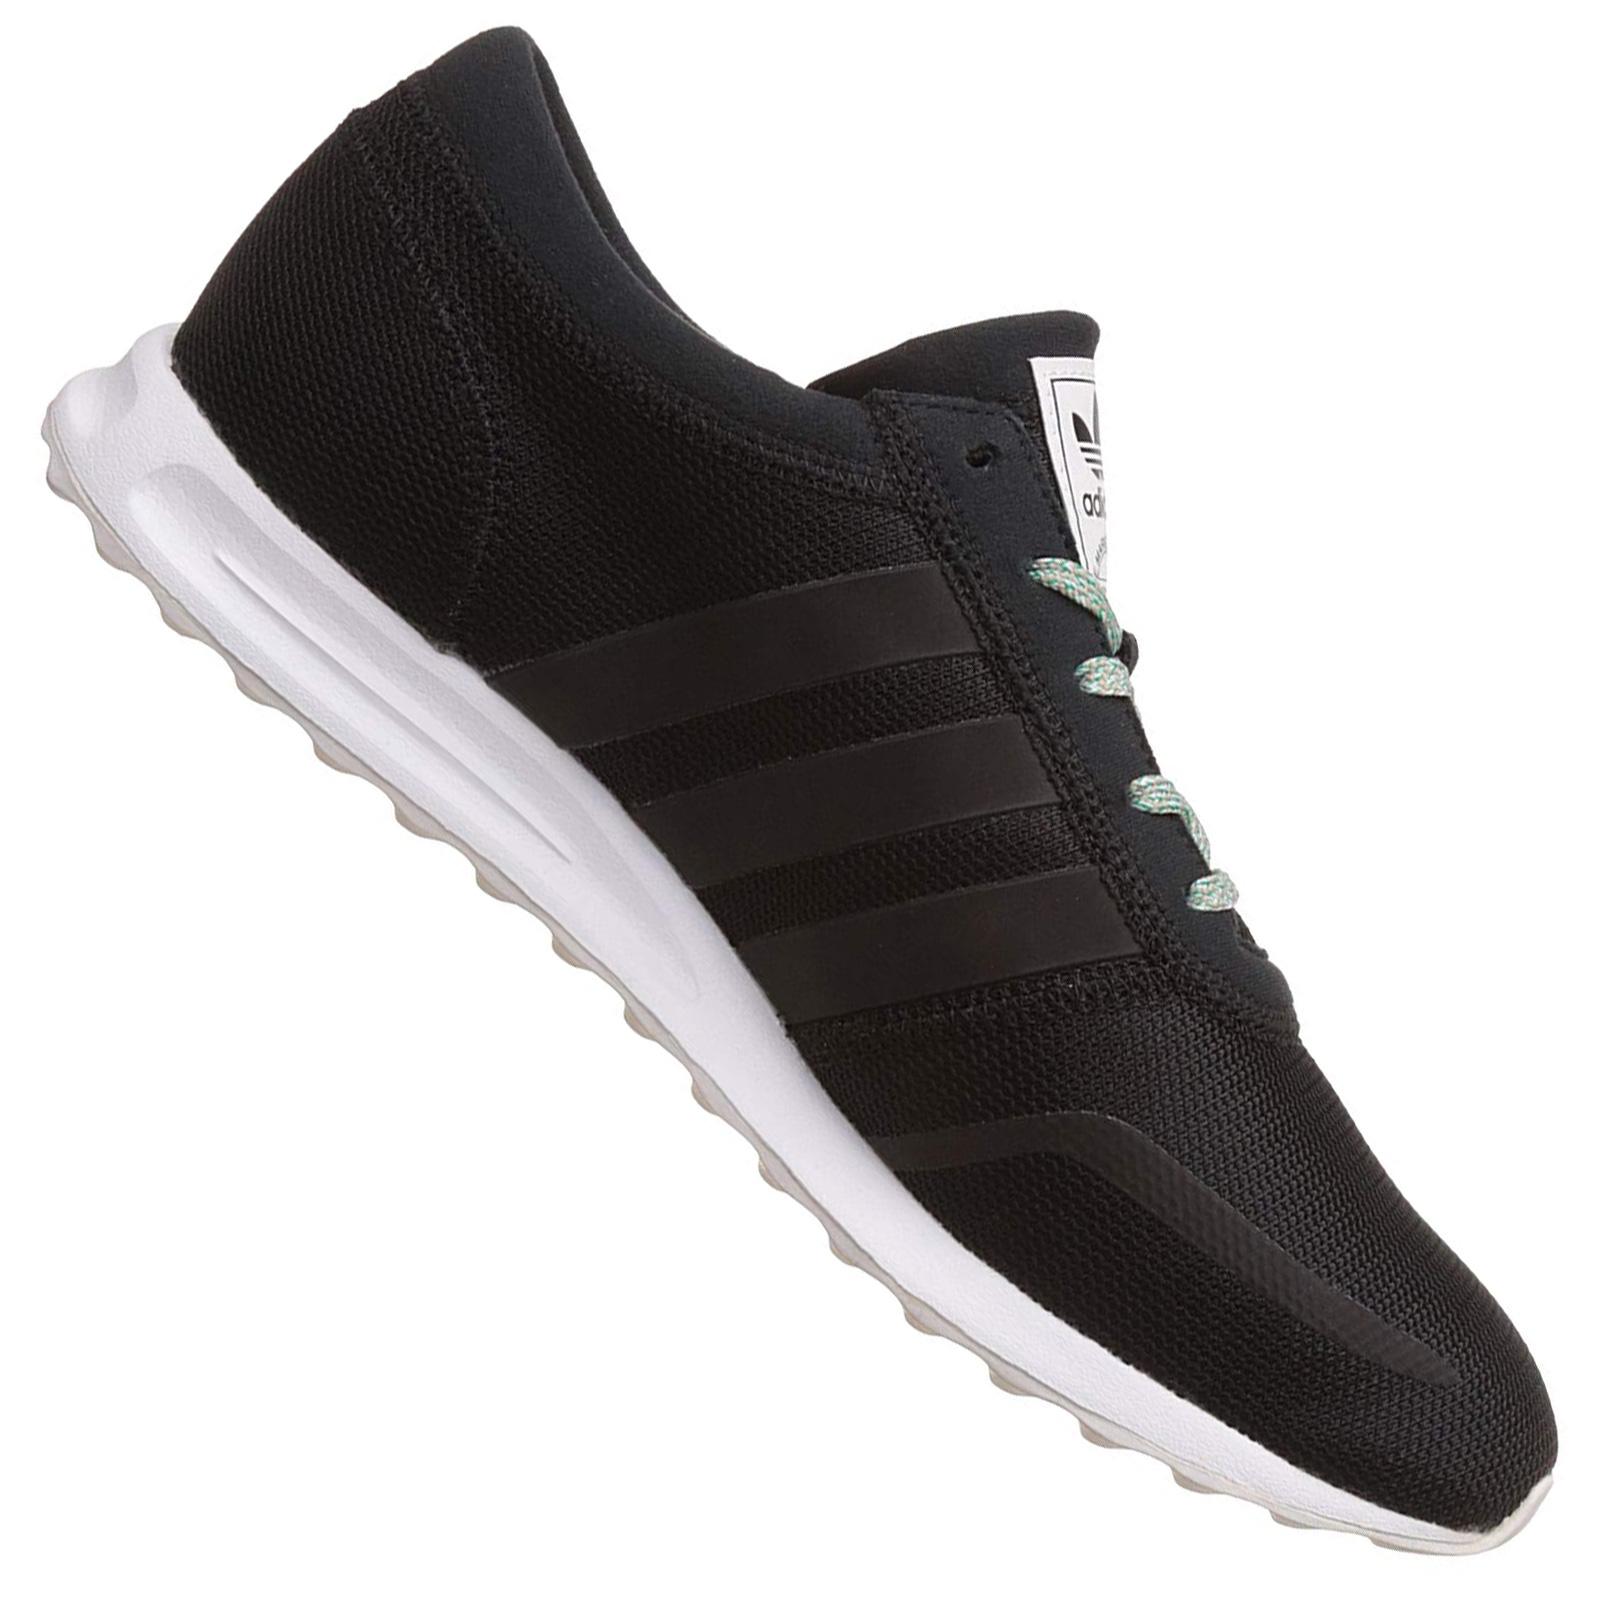 discount sale new high top quality Adidas Originals Kinder Los Angeles Sneaker La Trainer BB2466 Schwarz Weiß